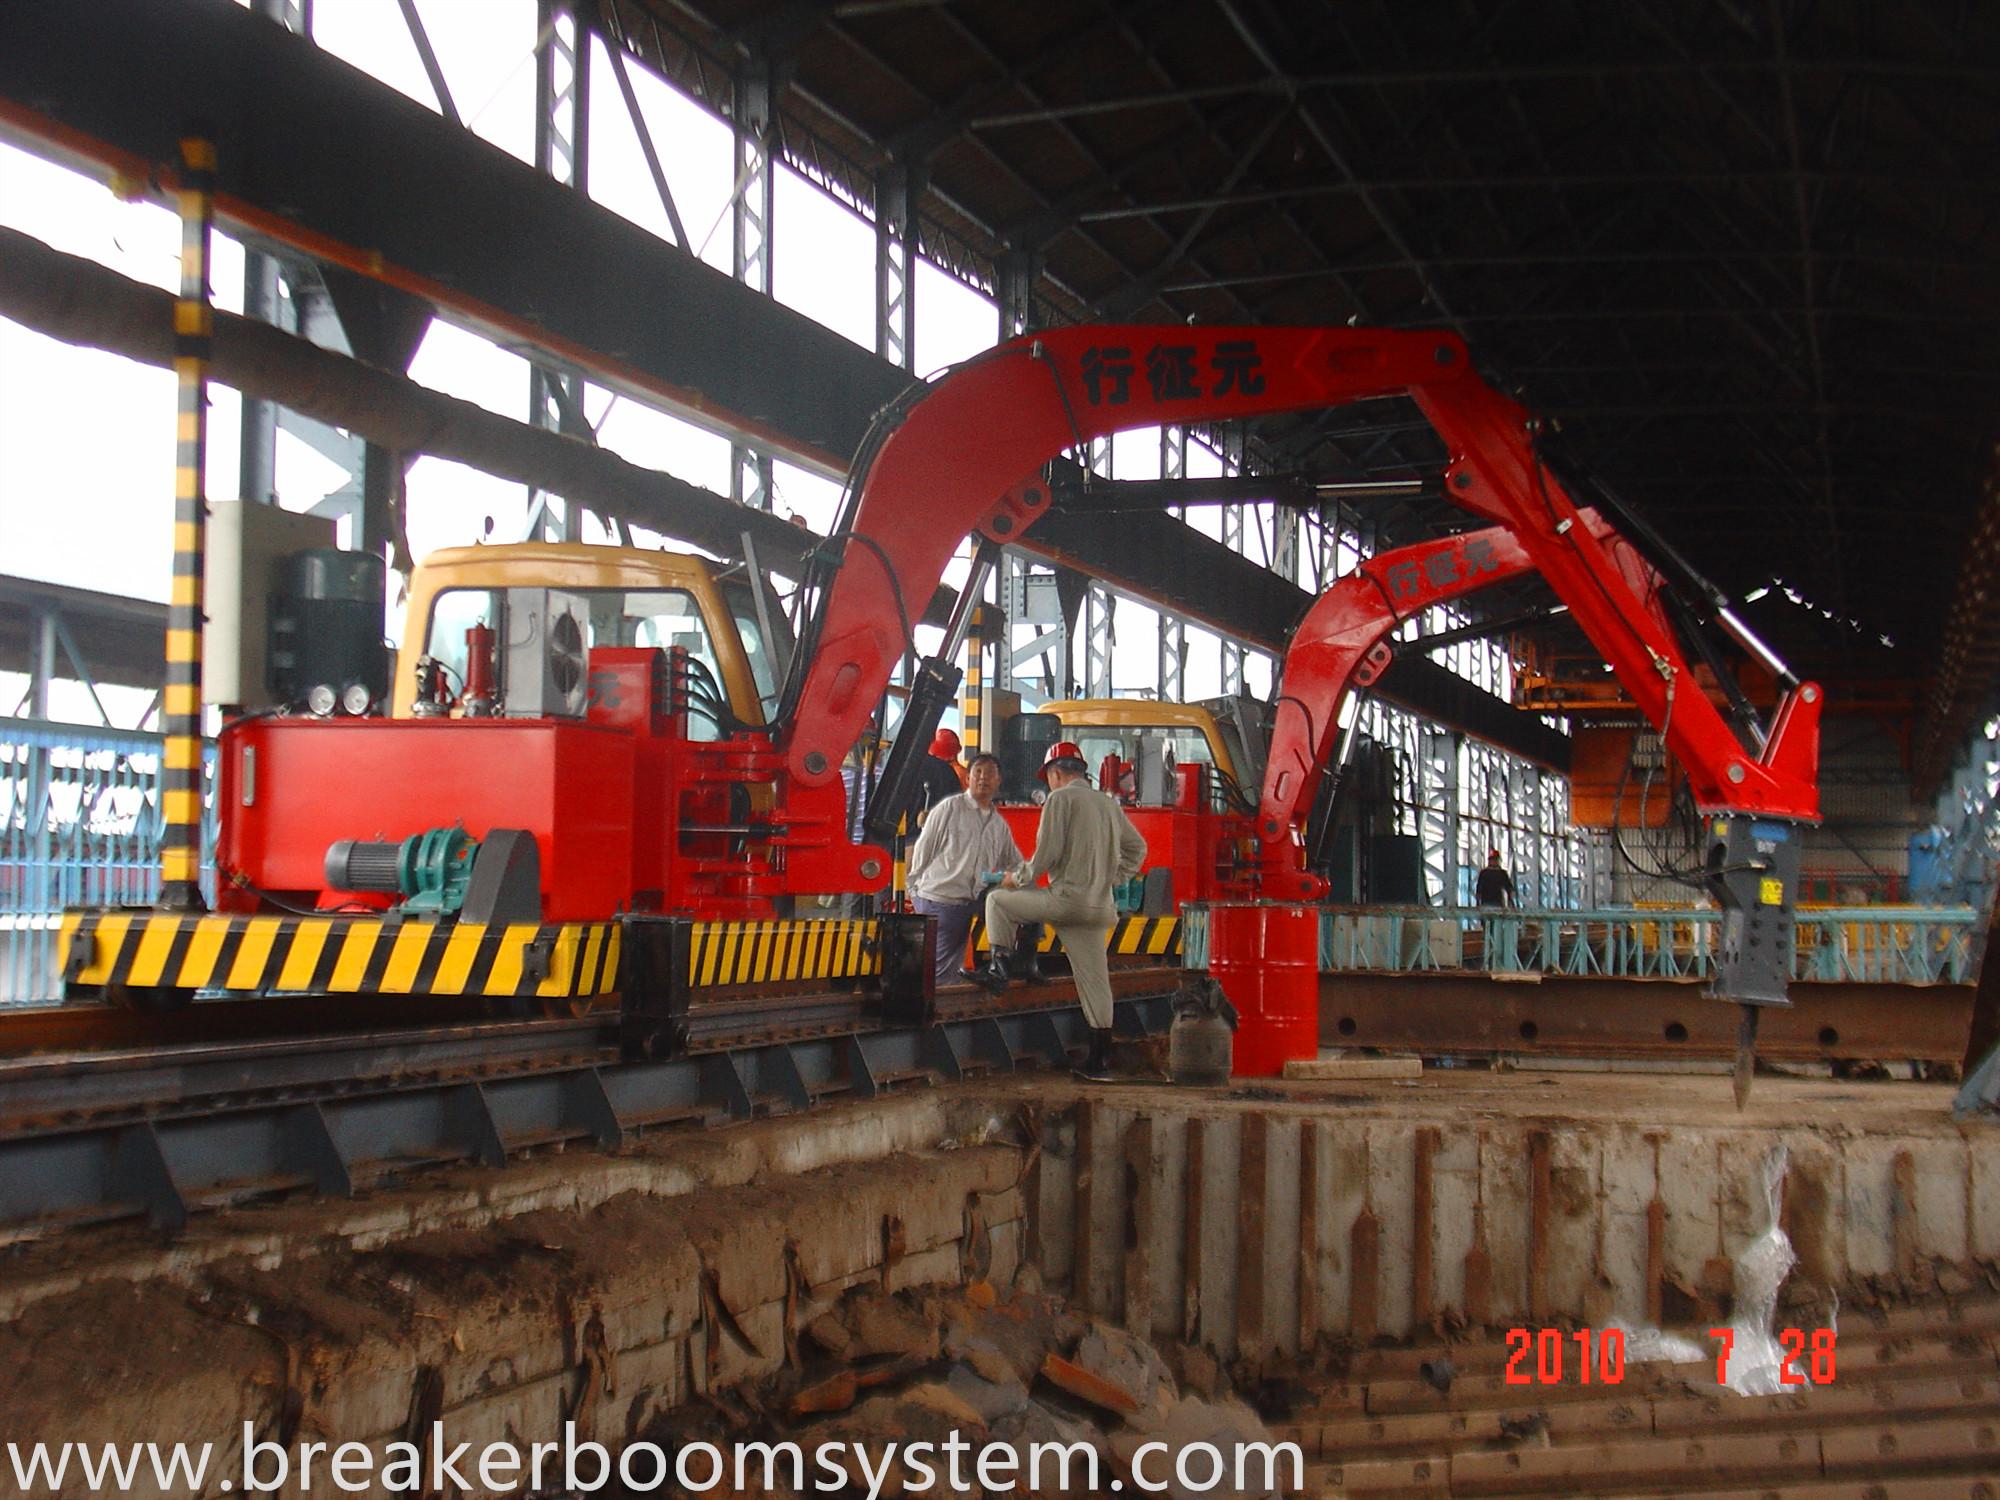 Fixed Type Rock Breaker Booms System